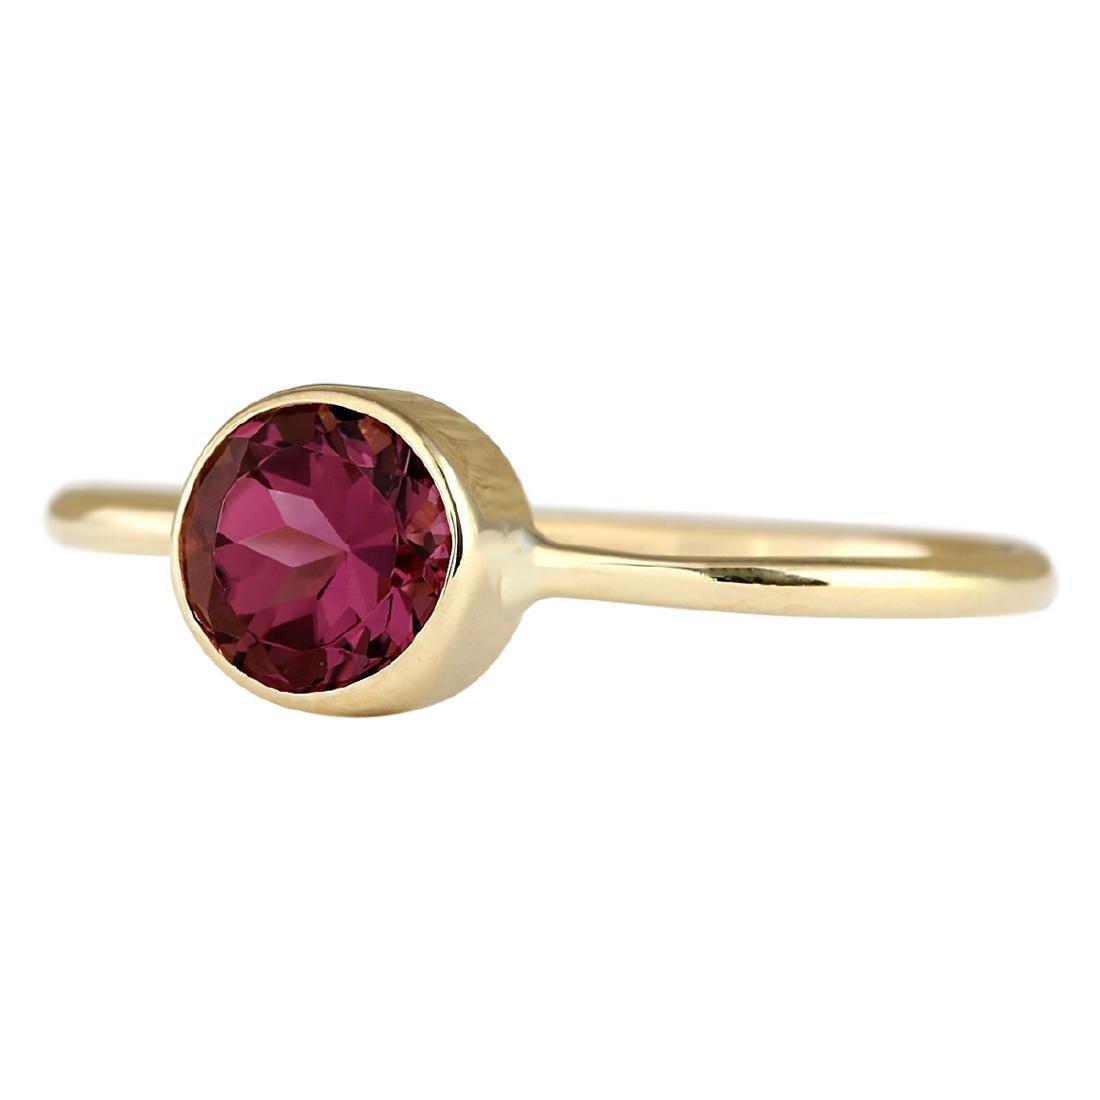 .80 CTW Natural Pink Tourmaline Ring In 18K Yellow Gold - 2